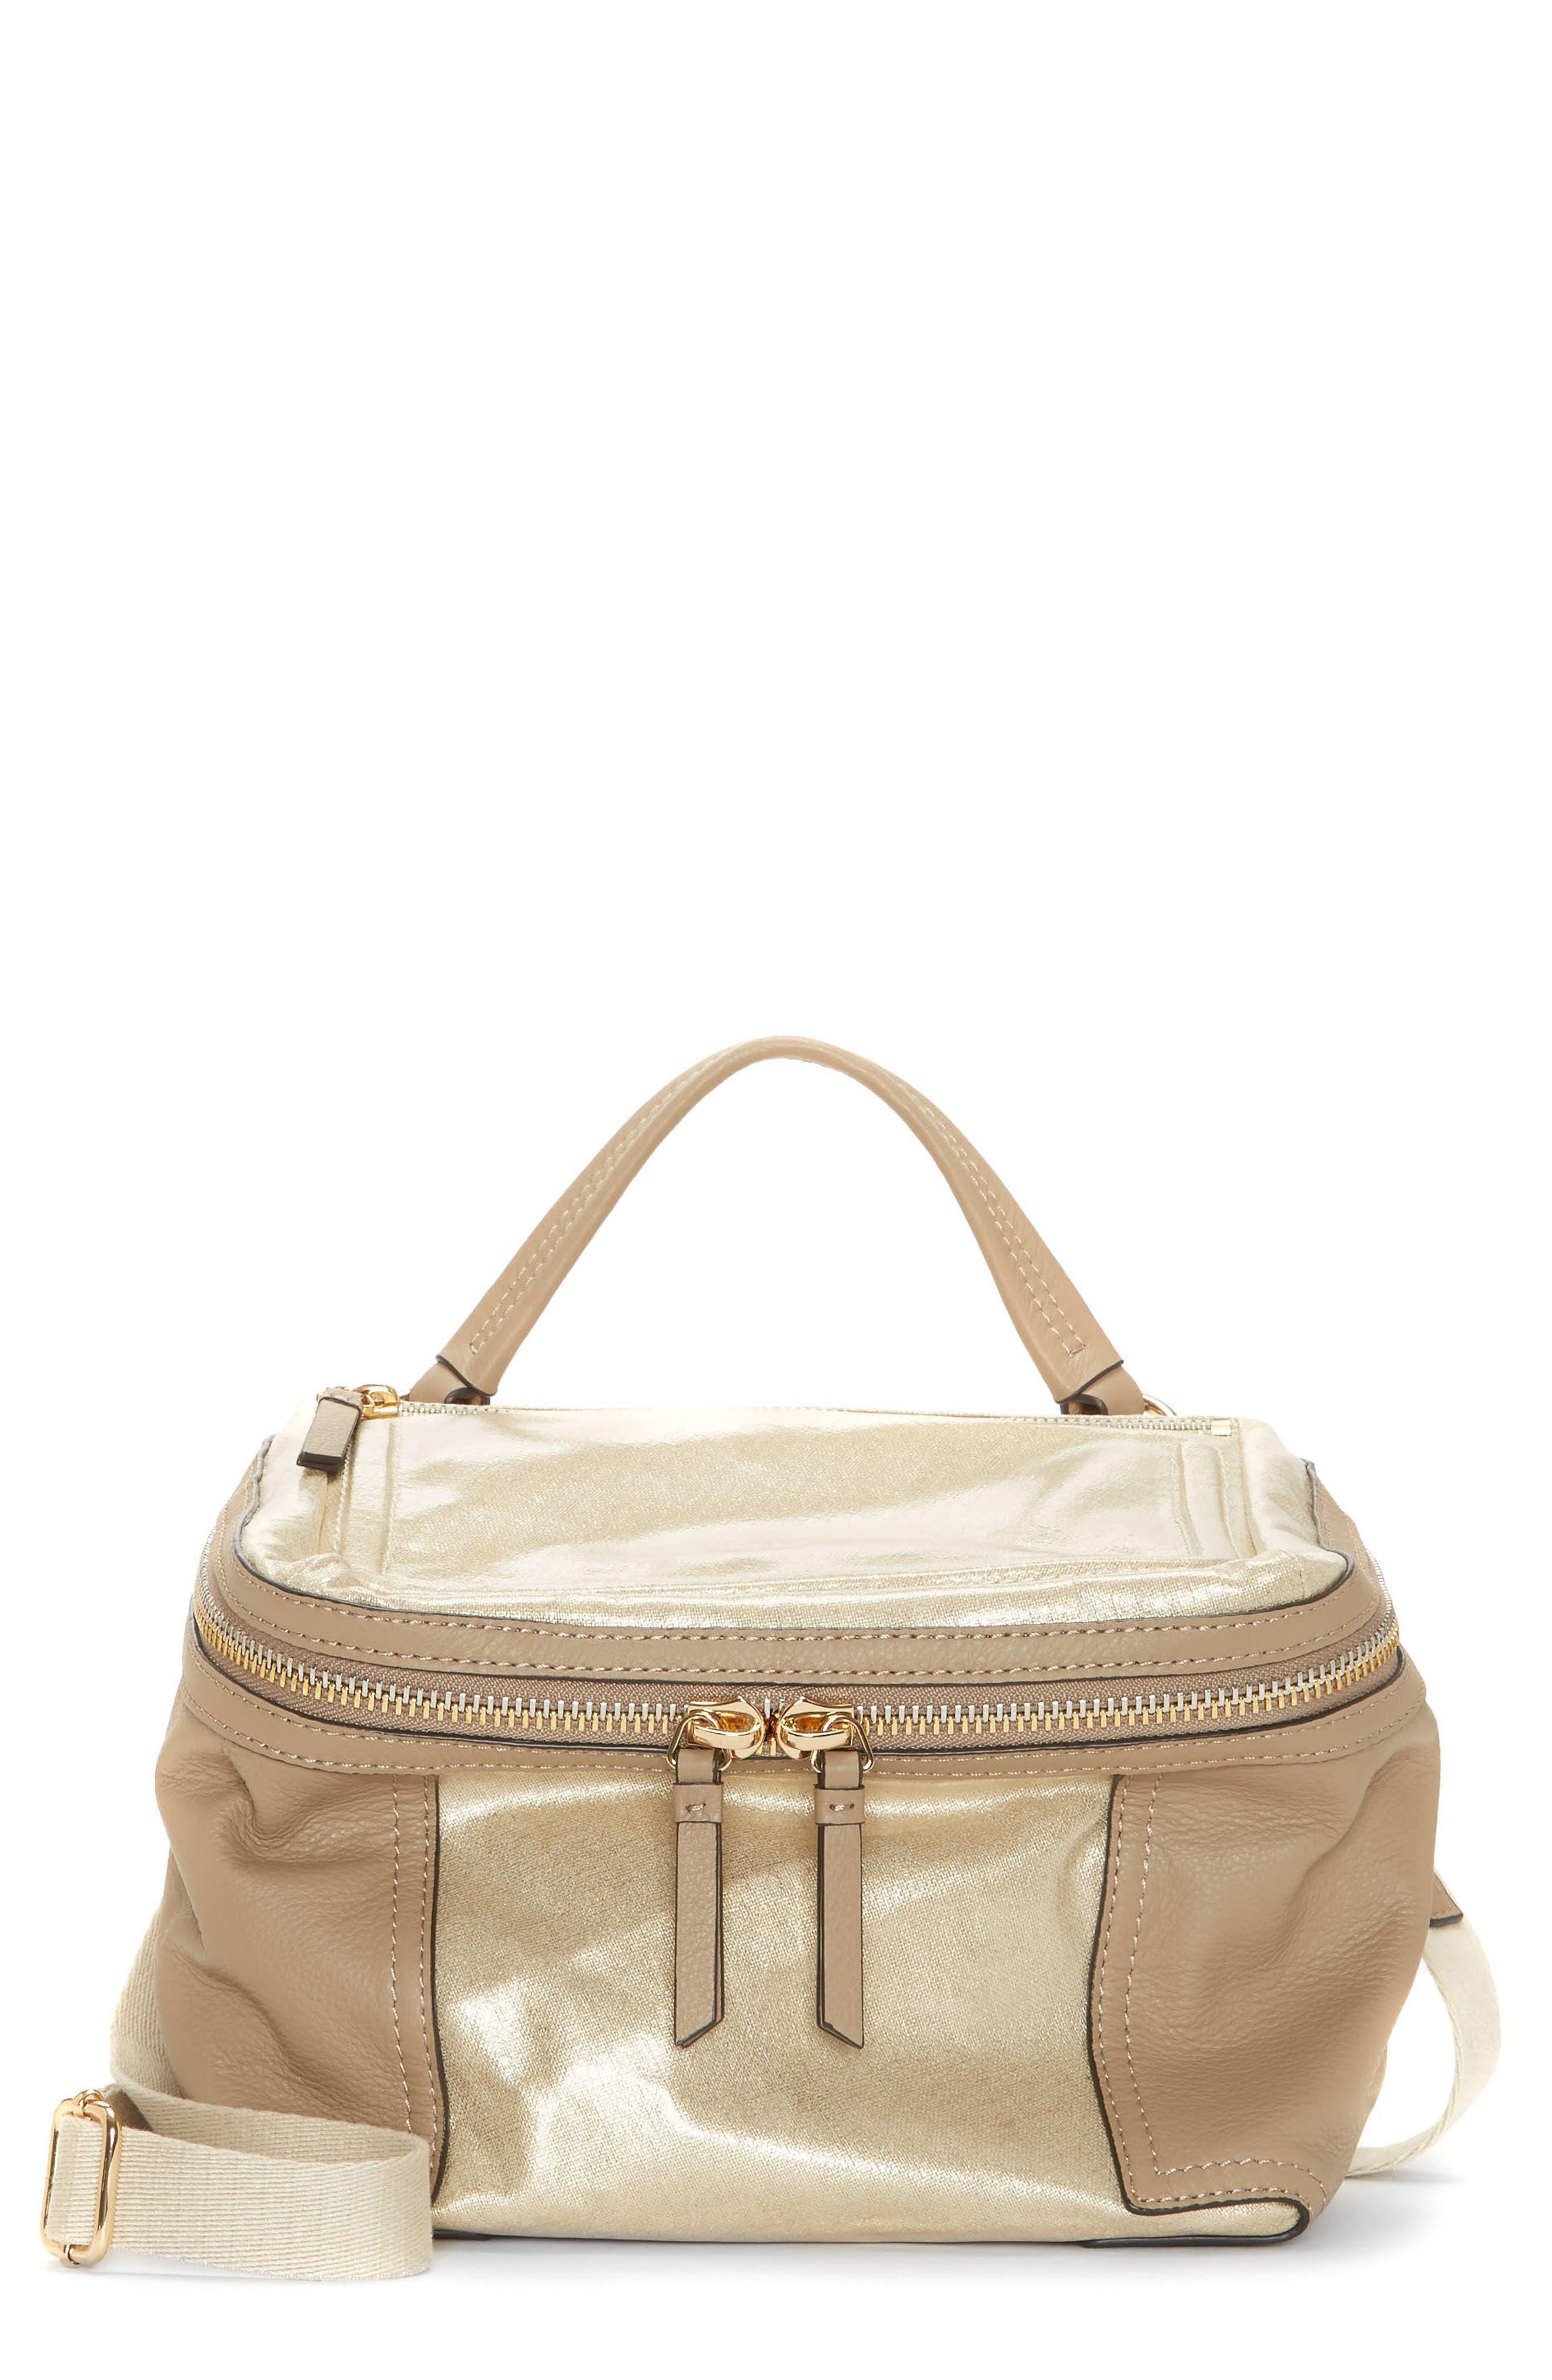 Medium Patch Nylon & Leather Crossbody Bag,                             Main thumbnail 1, color,                             Gold